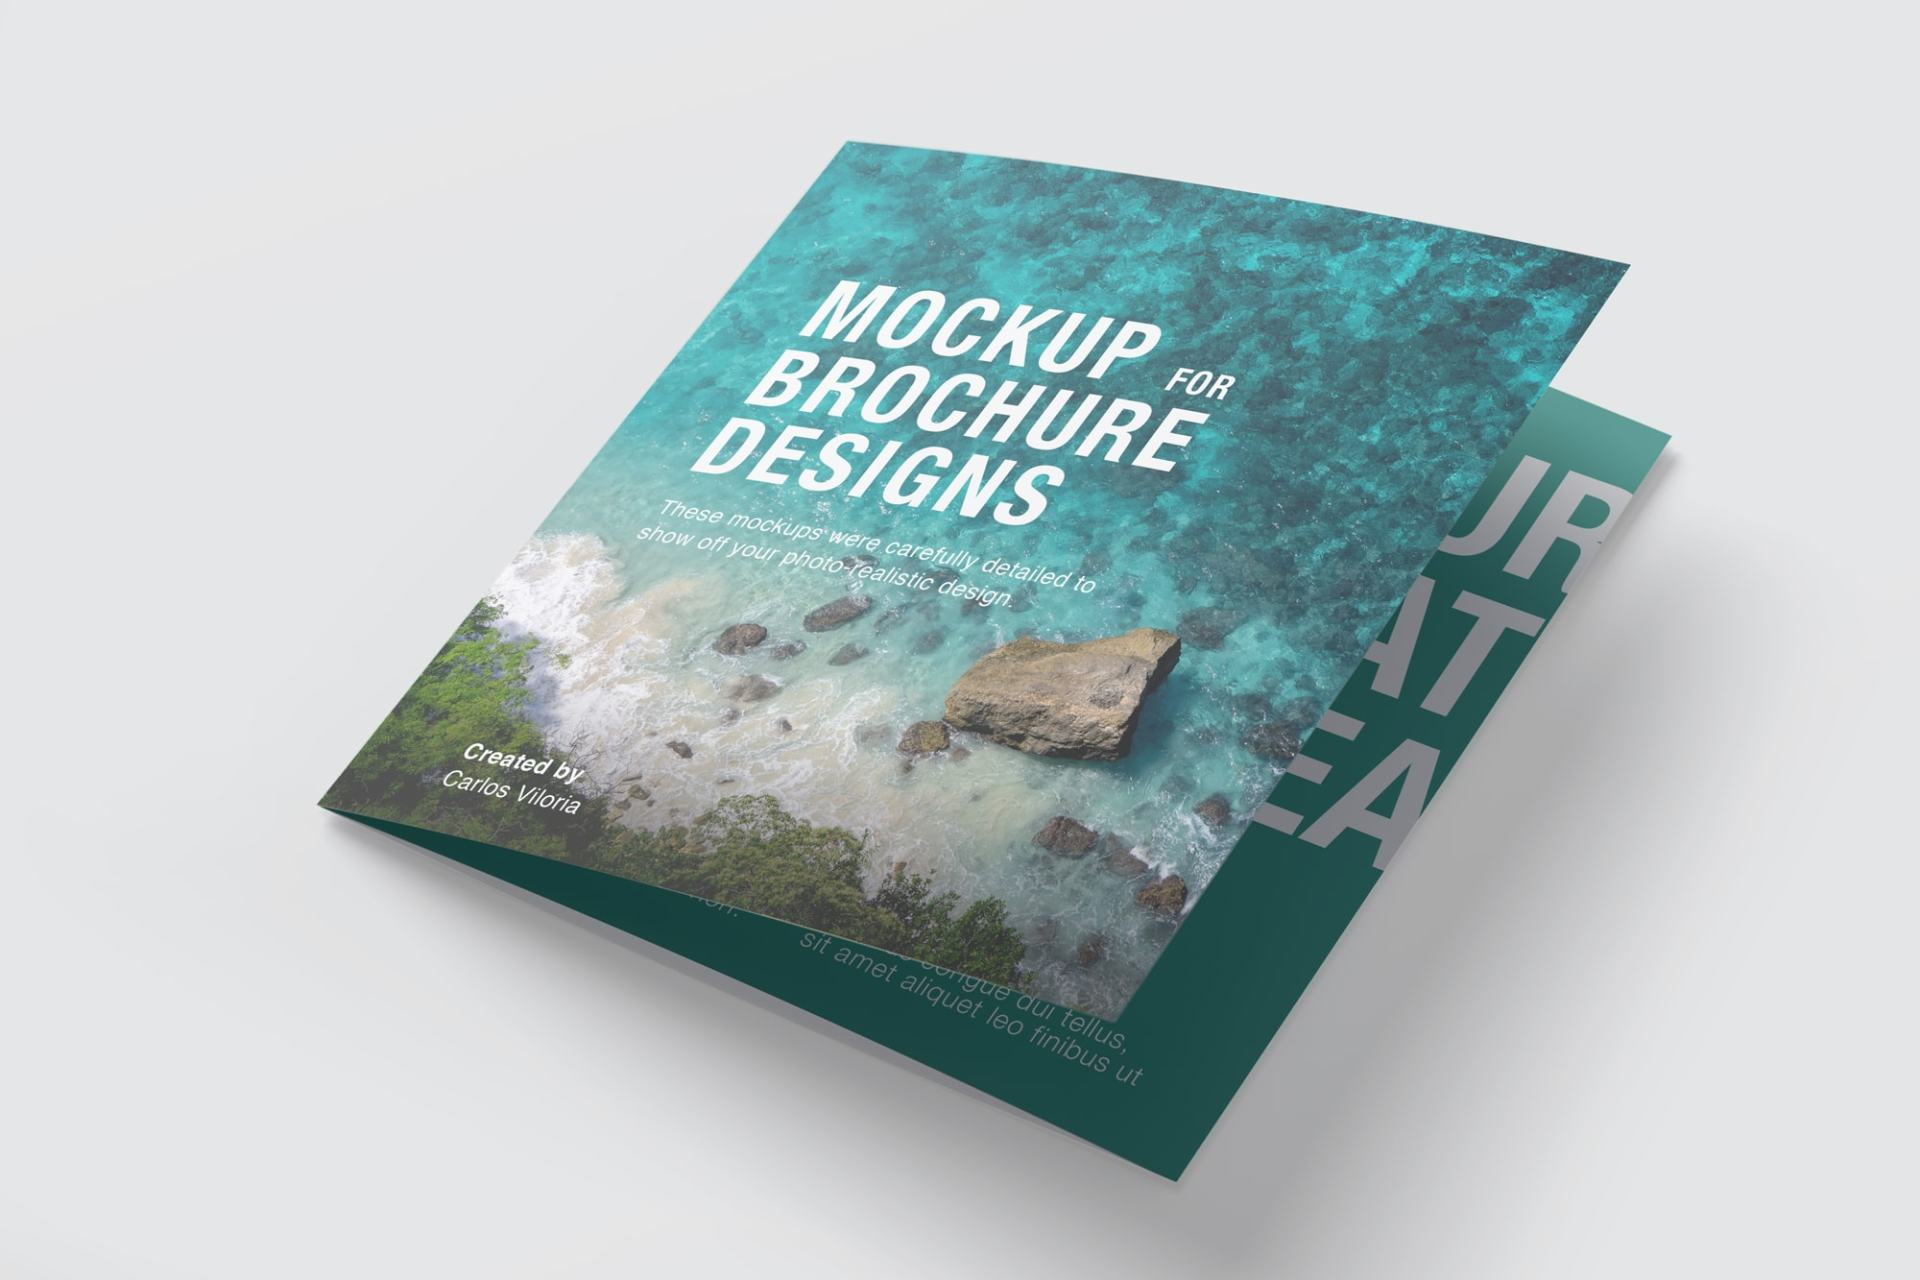 Square Trifold Brochure Cover Mockup 01